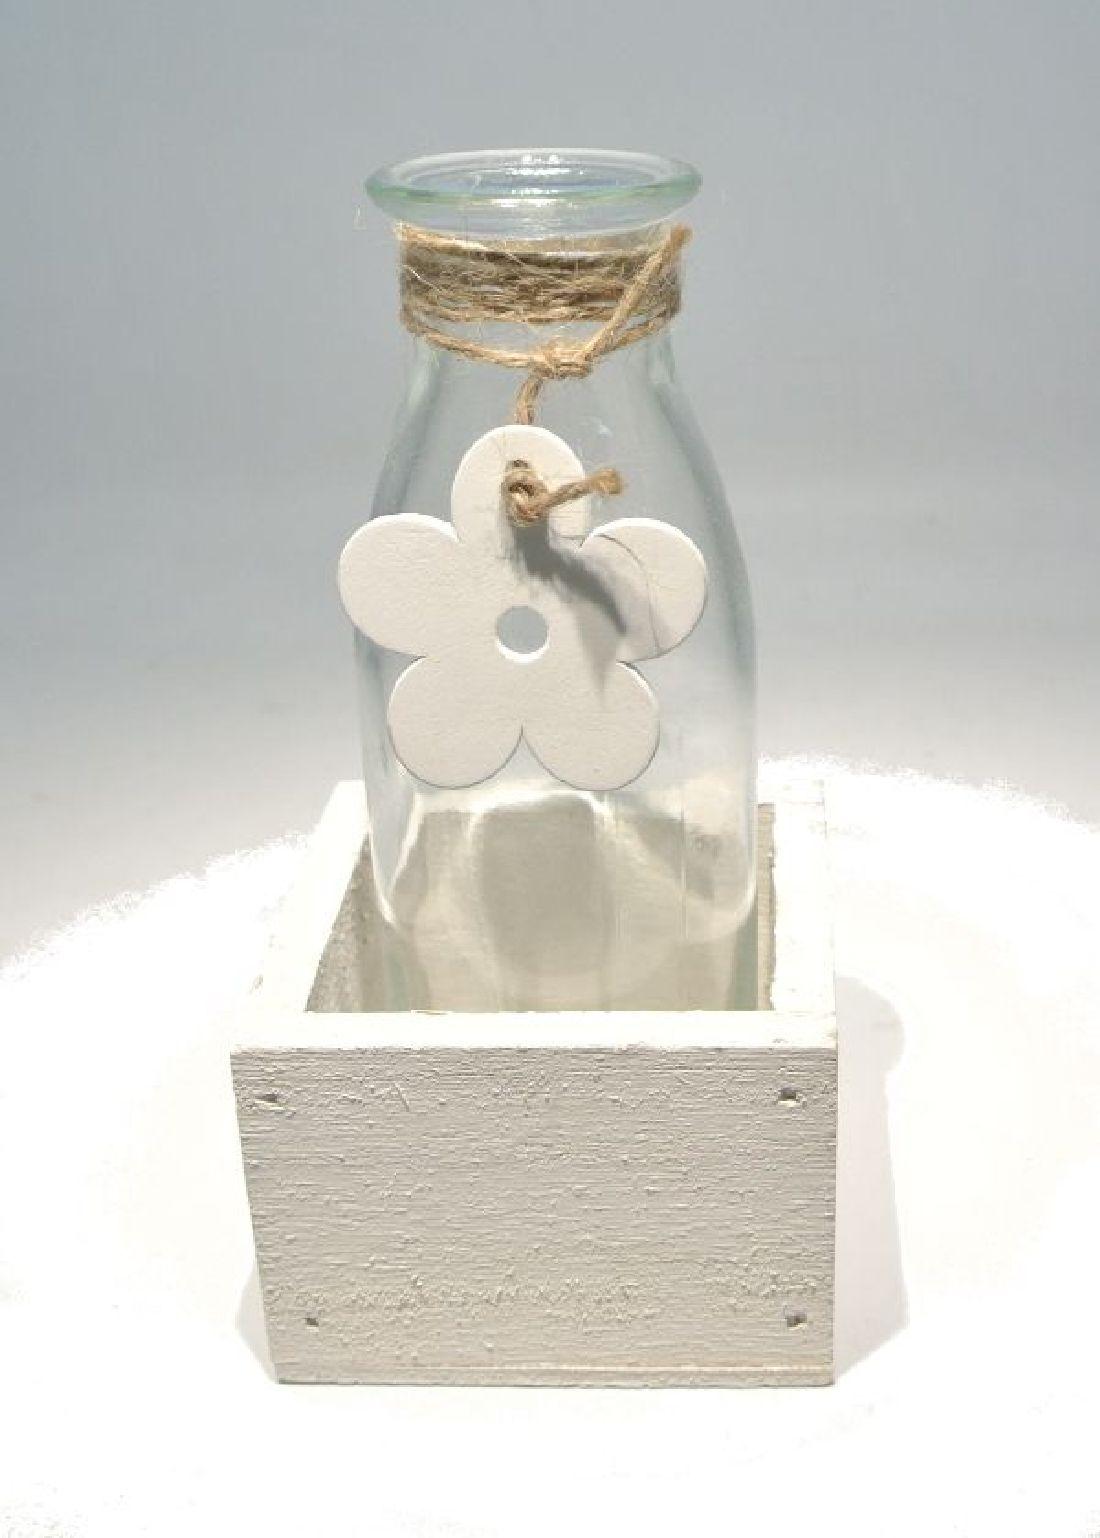 Glasflasche Flower in Holzbox WEISS 17803 1er 7x7xH14,5cm